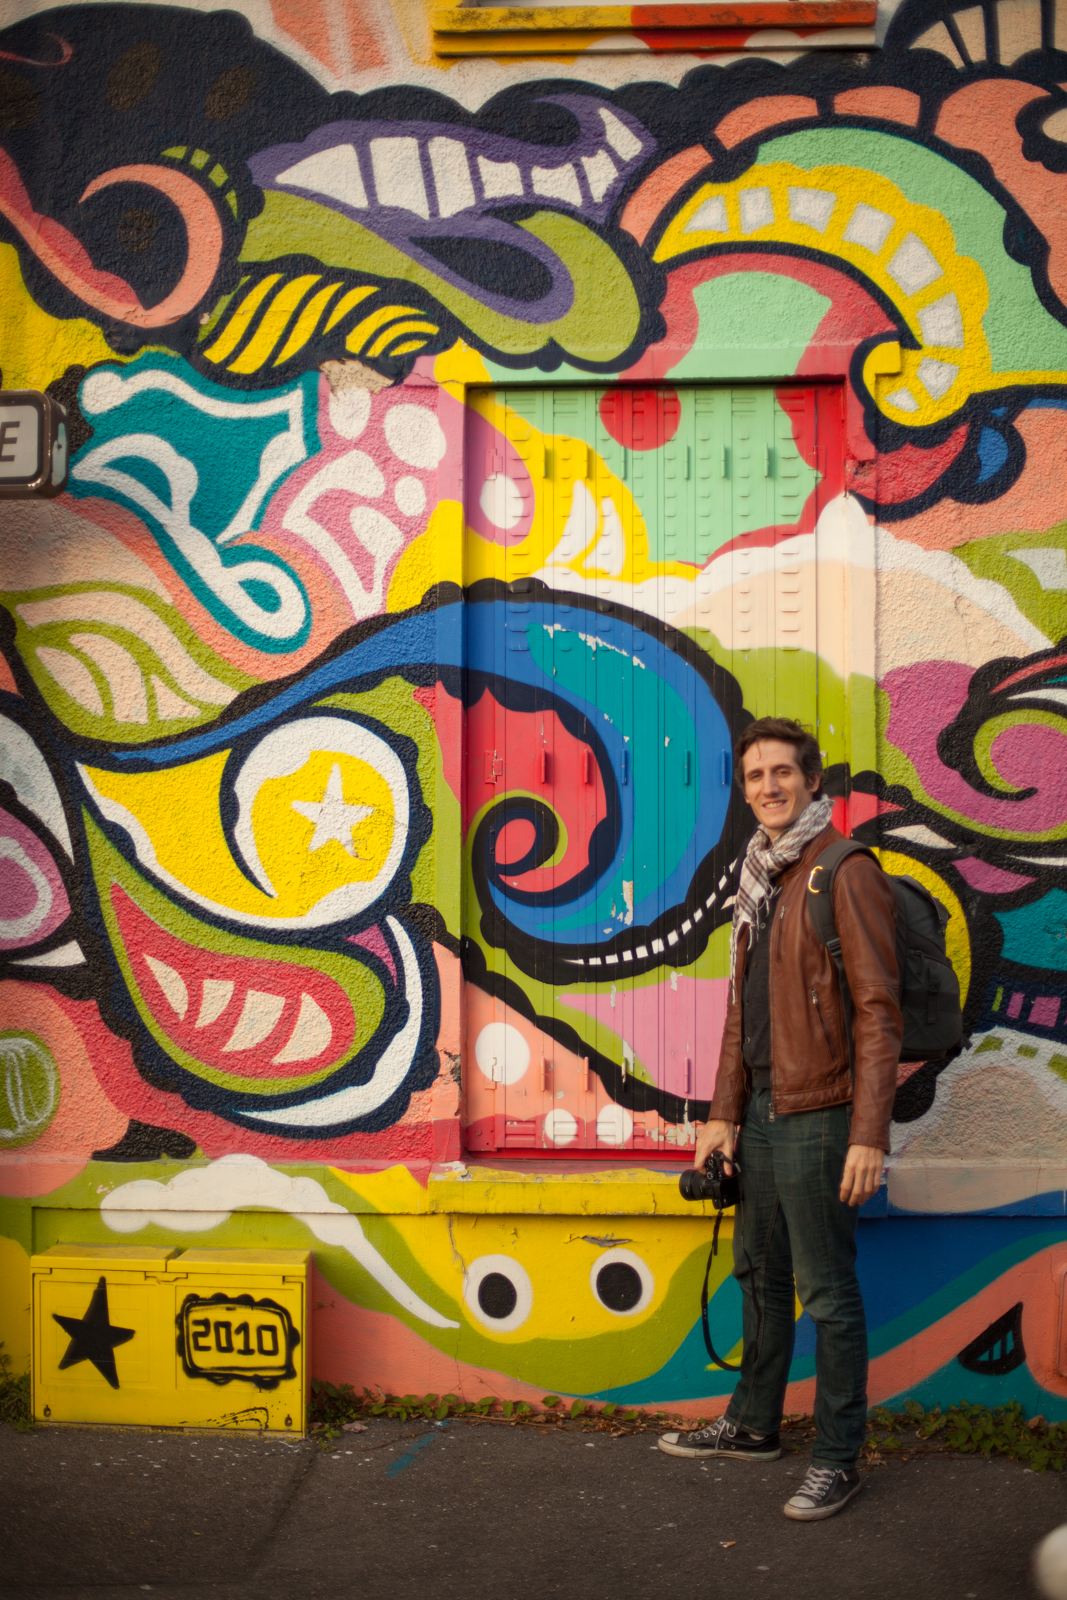 street art vitry-sur-seine, street art vitry, street art val-de-marne, street art banlieue paris, art urbain vitry, art urbain vitry-sur-seine, art urbain vitry, le guide du street art à paris, stéphanie lombard, daCruz, artof popof